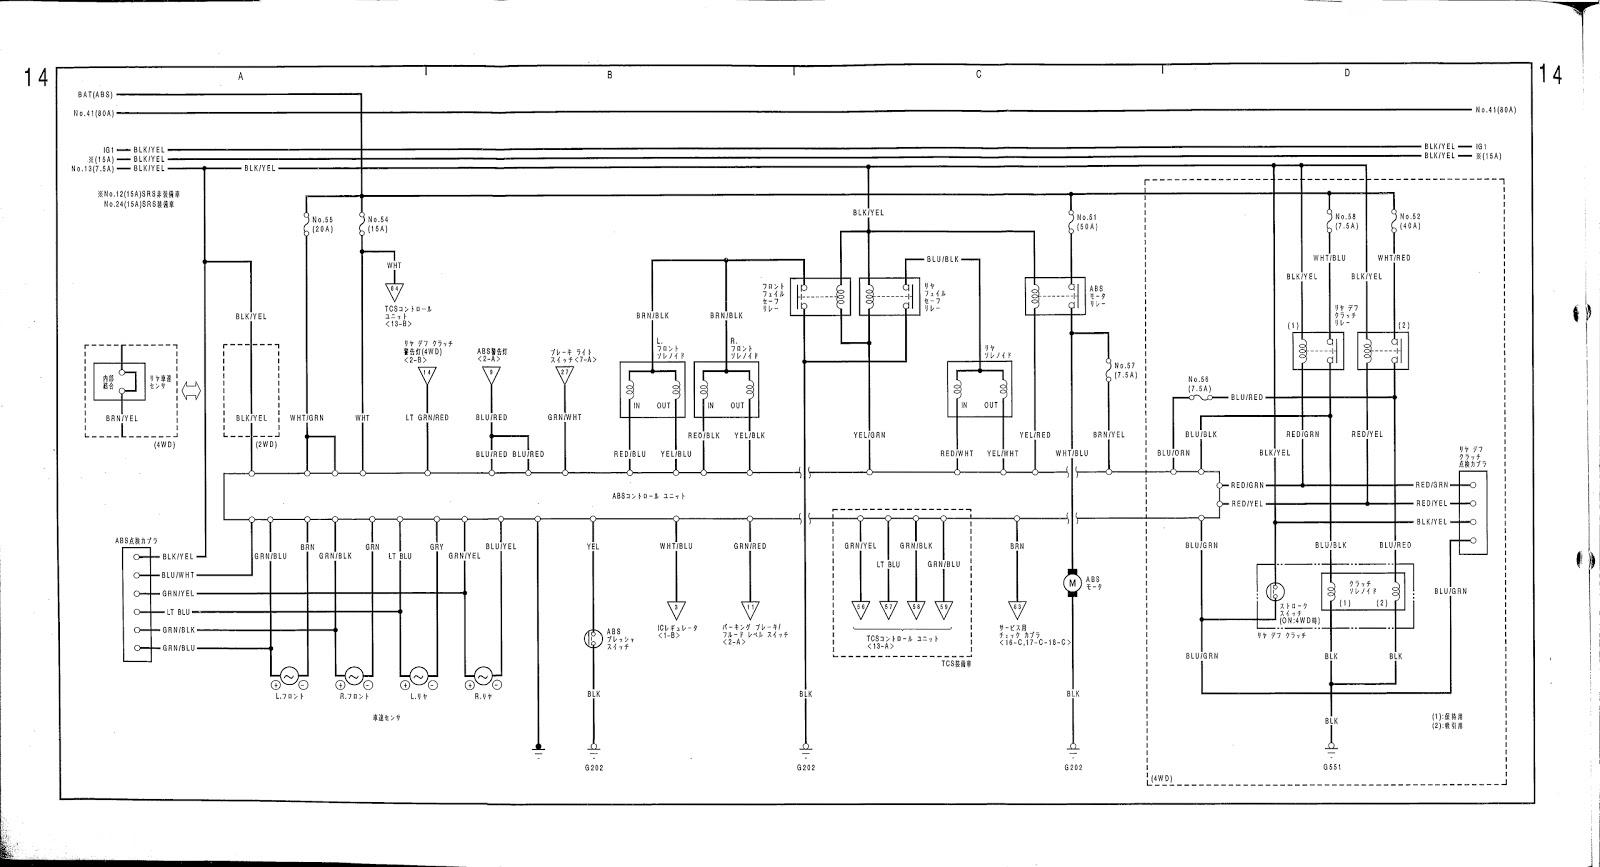 [DIAGRAM] Honda Civic Vti Wiring Diagram FULL Version HD